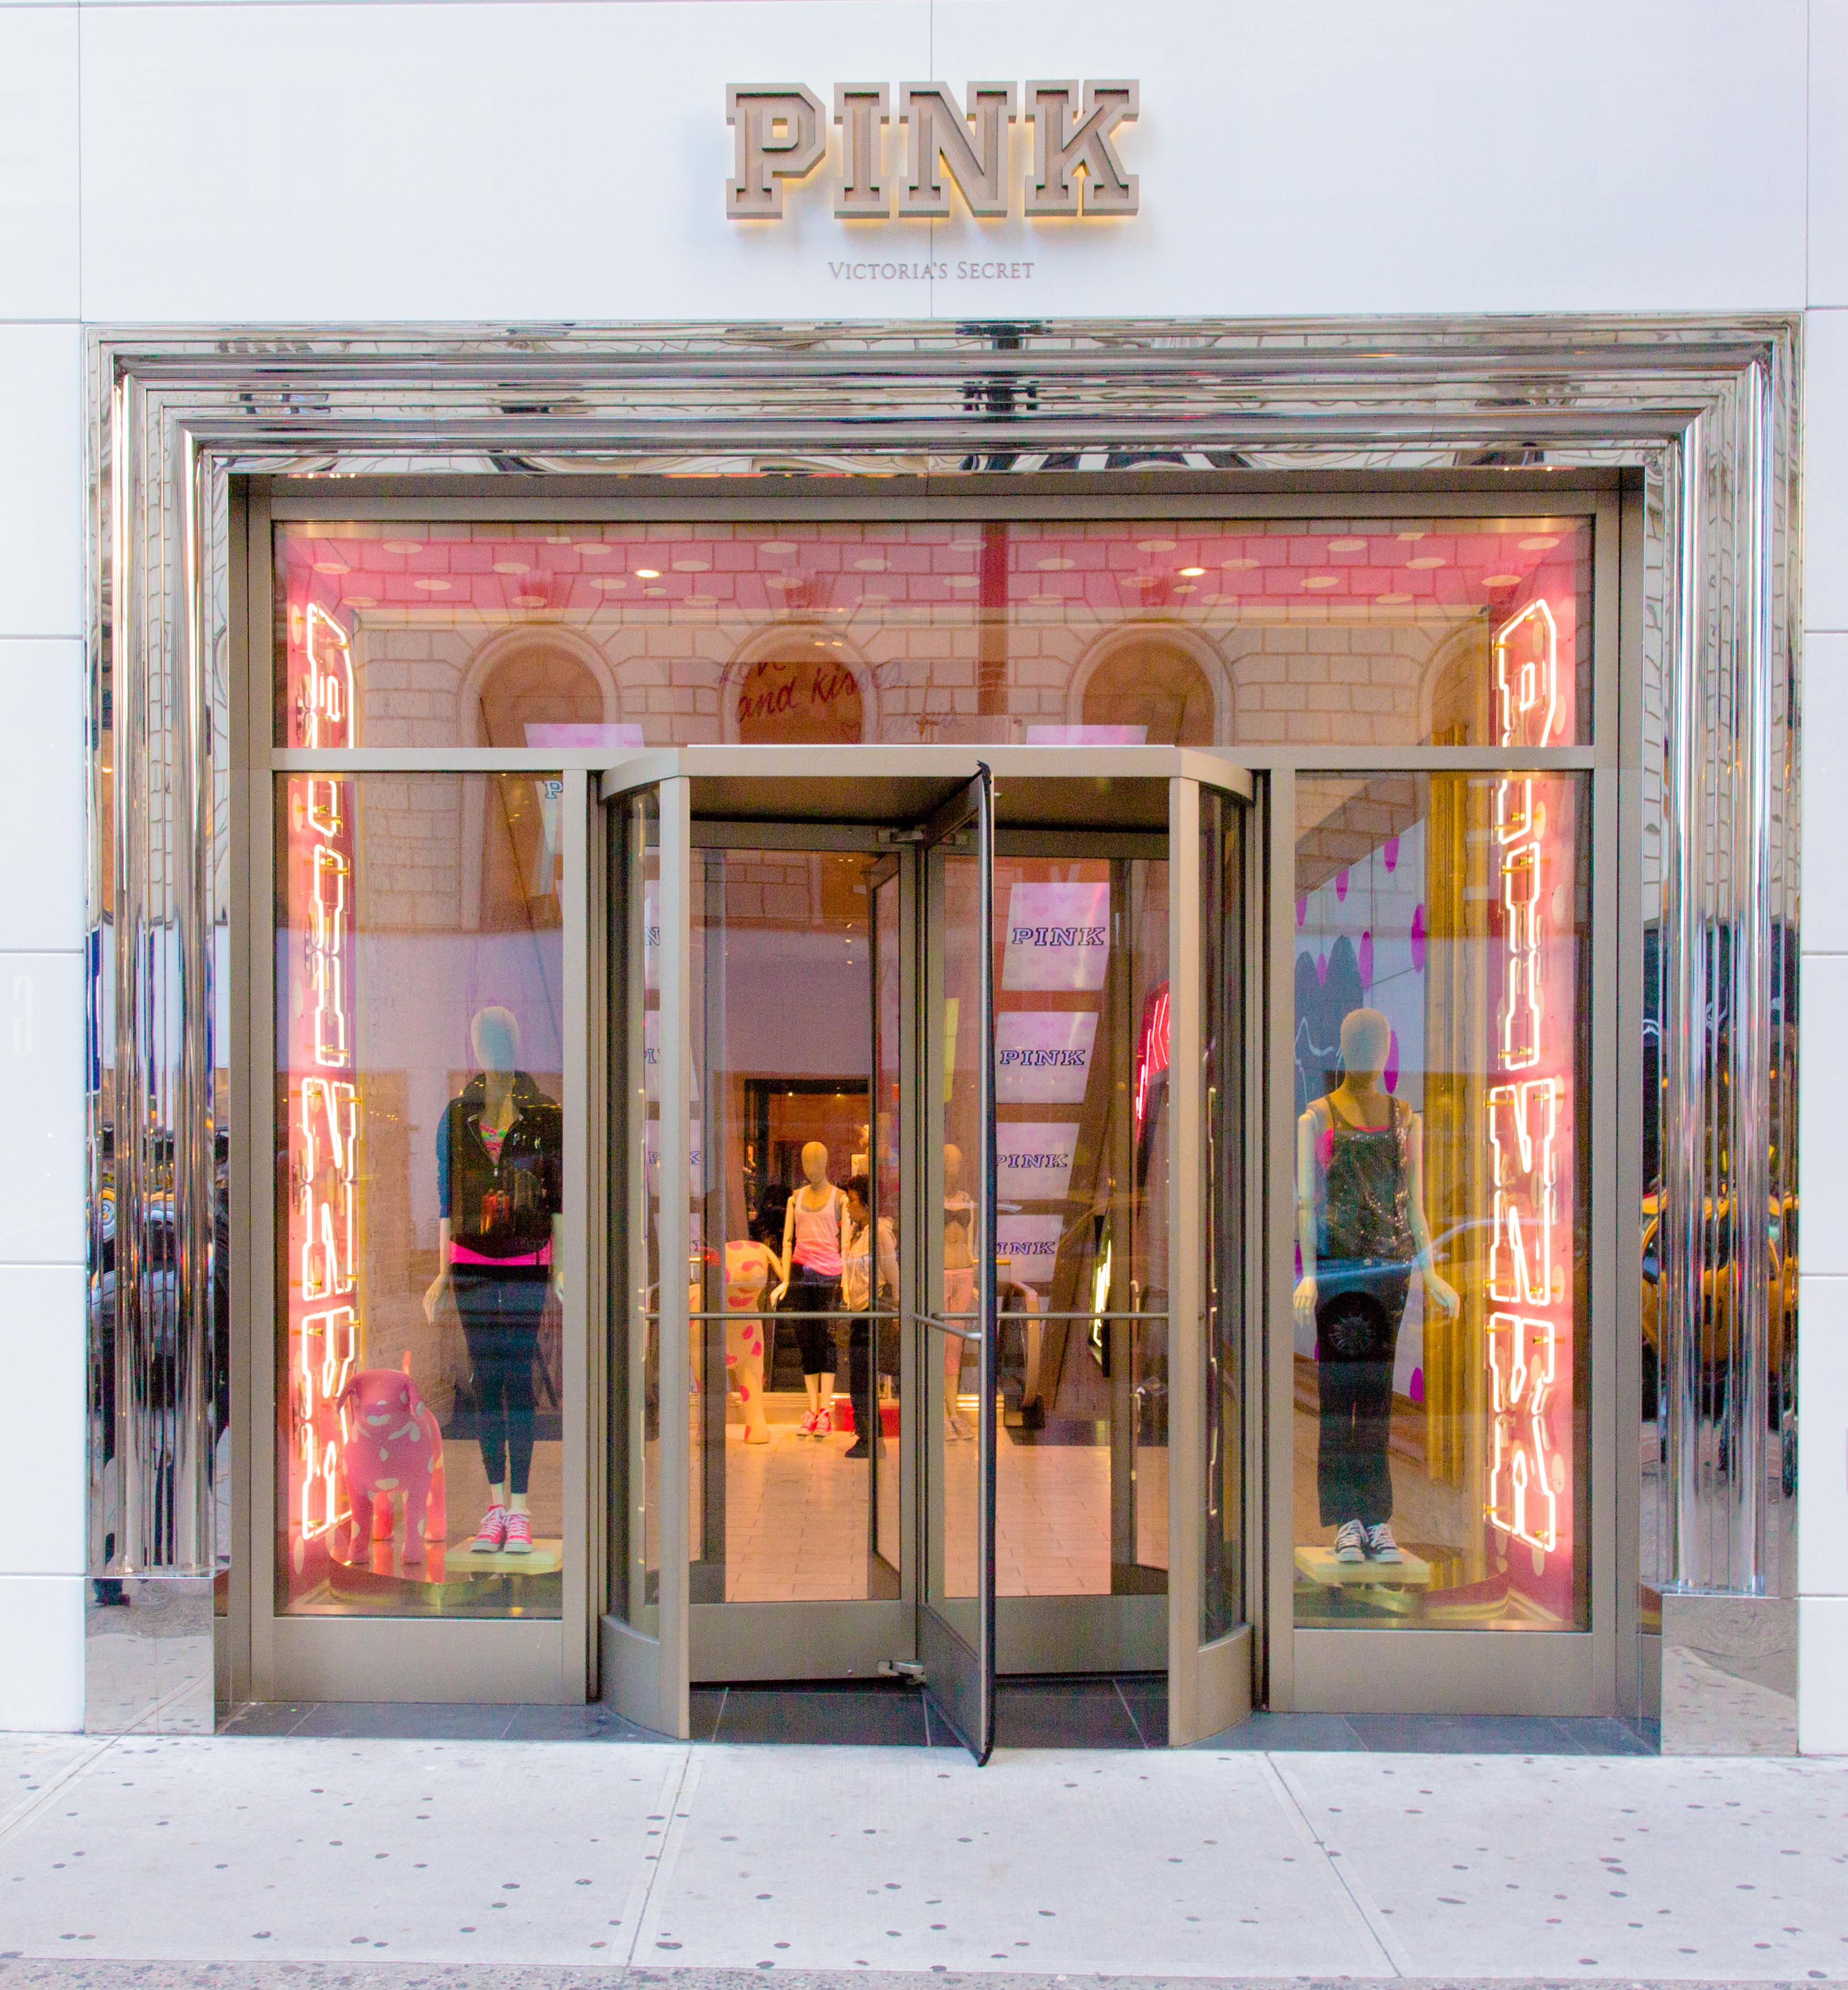 Designer Clothing Stores In Victoria Bc Victoria s Secret Pink Store